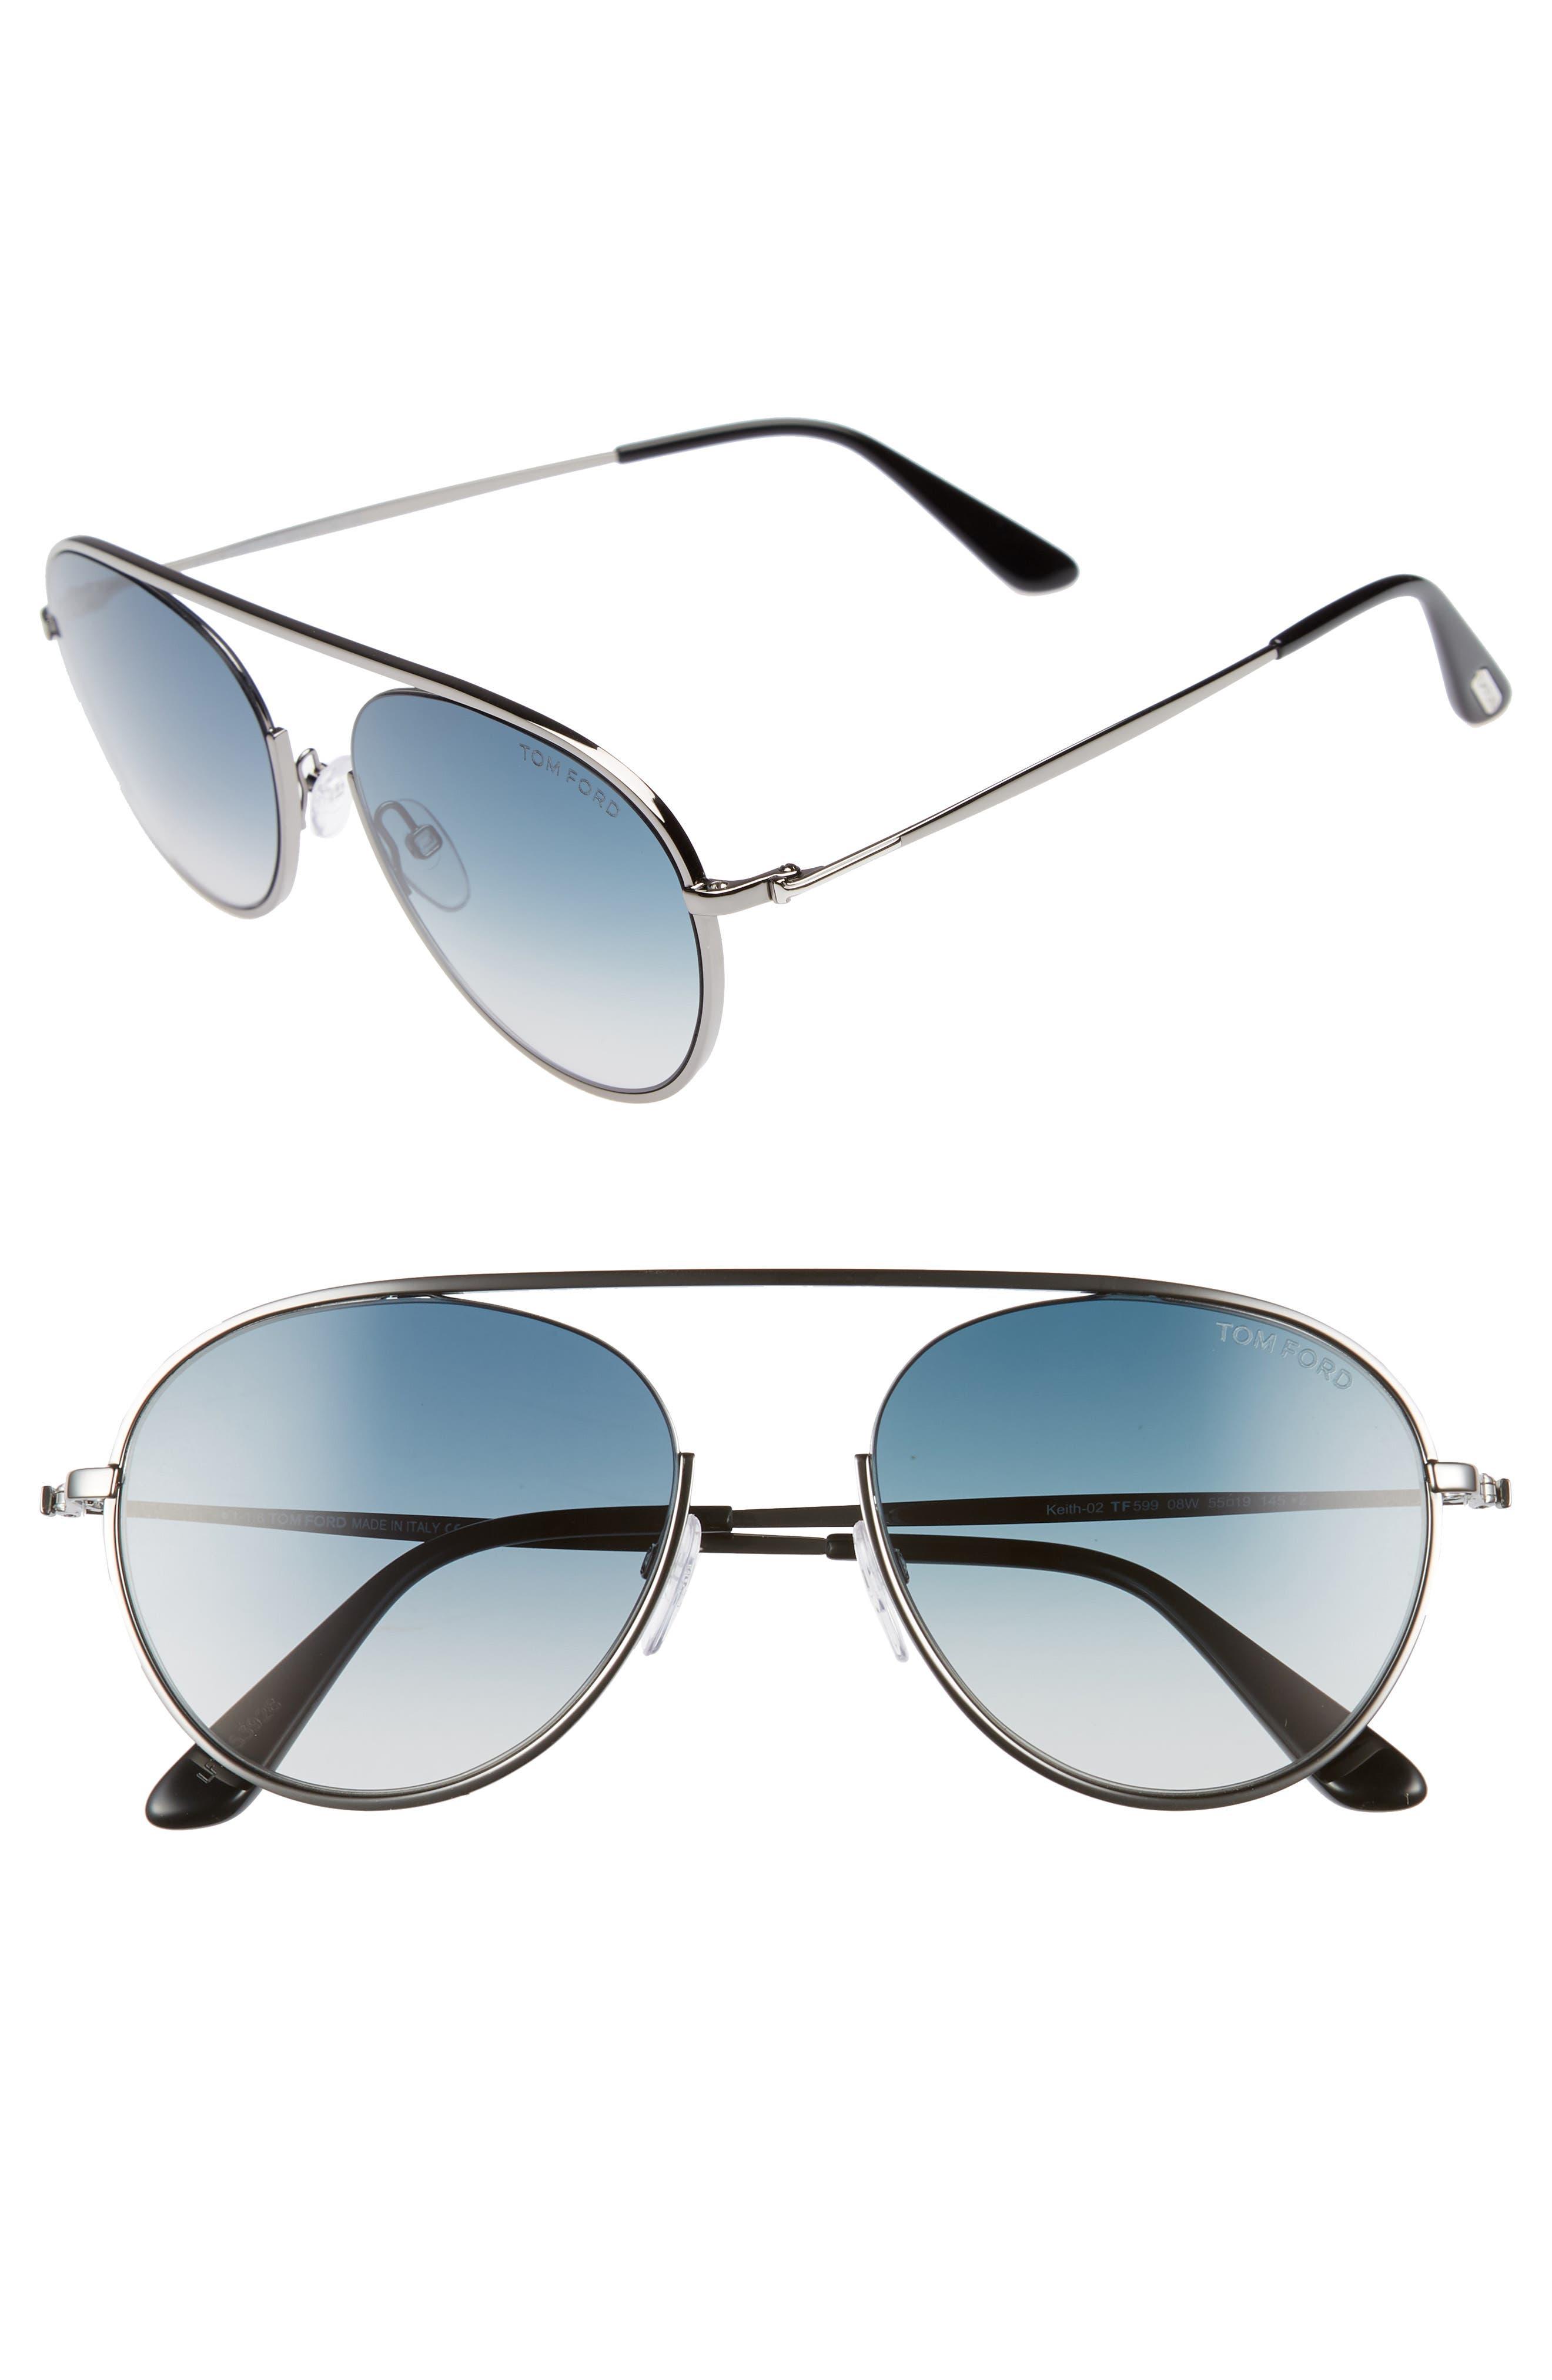 Keith 55mm Metal Aviator Sunglasses,                         Main,                         color, Shiny Gumetal/ Gradient Blue